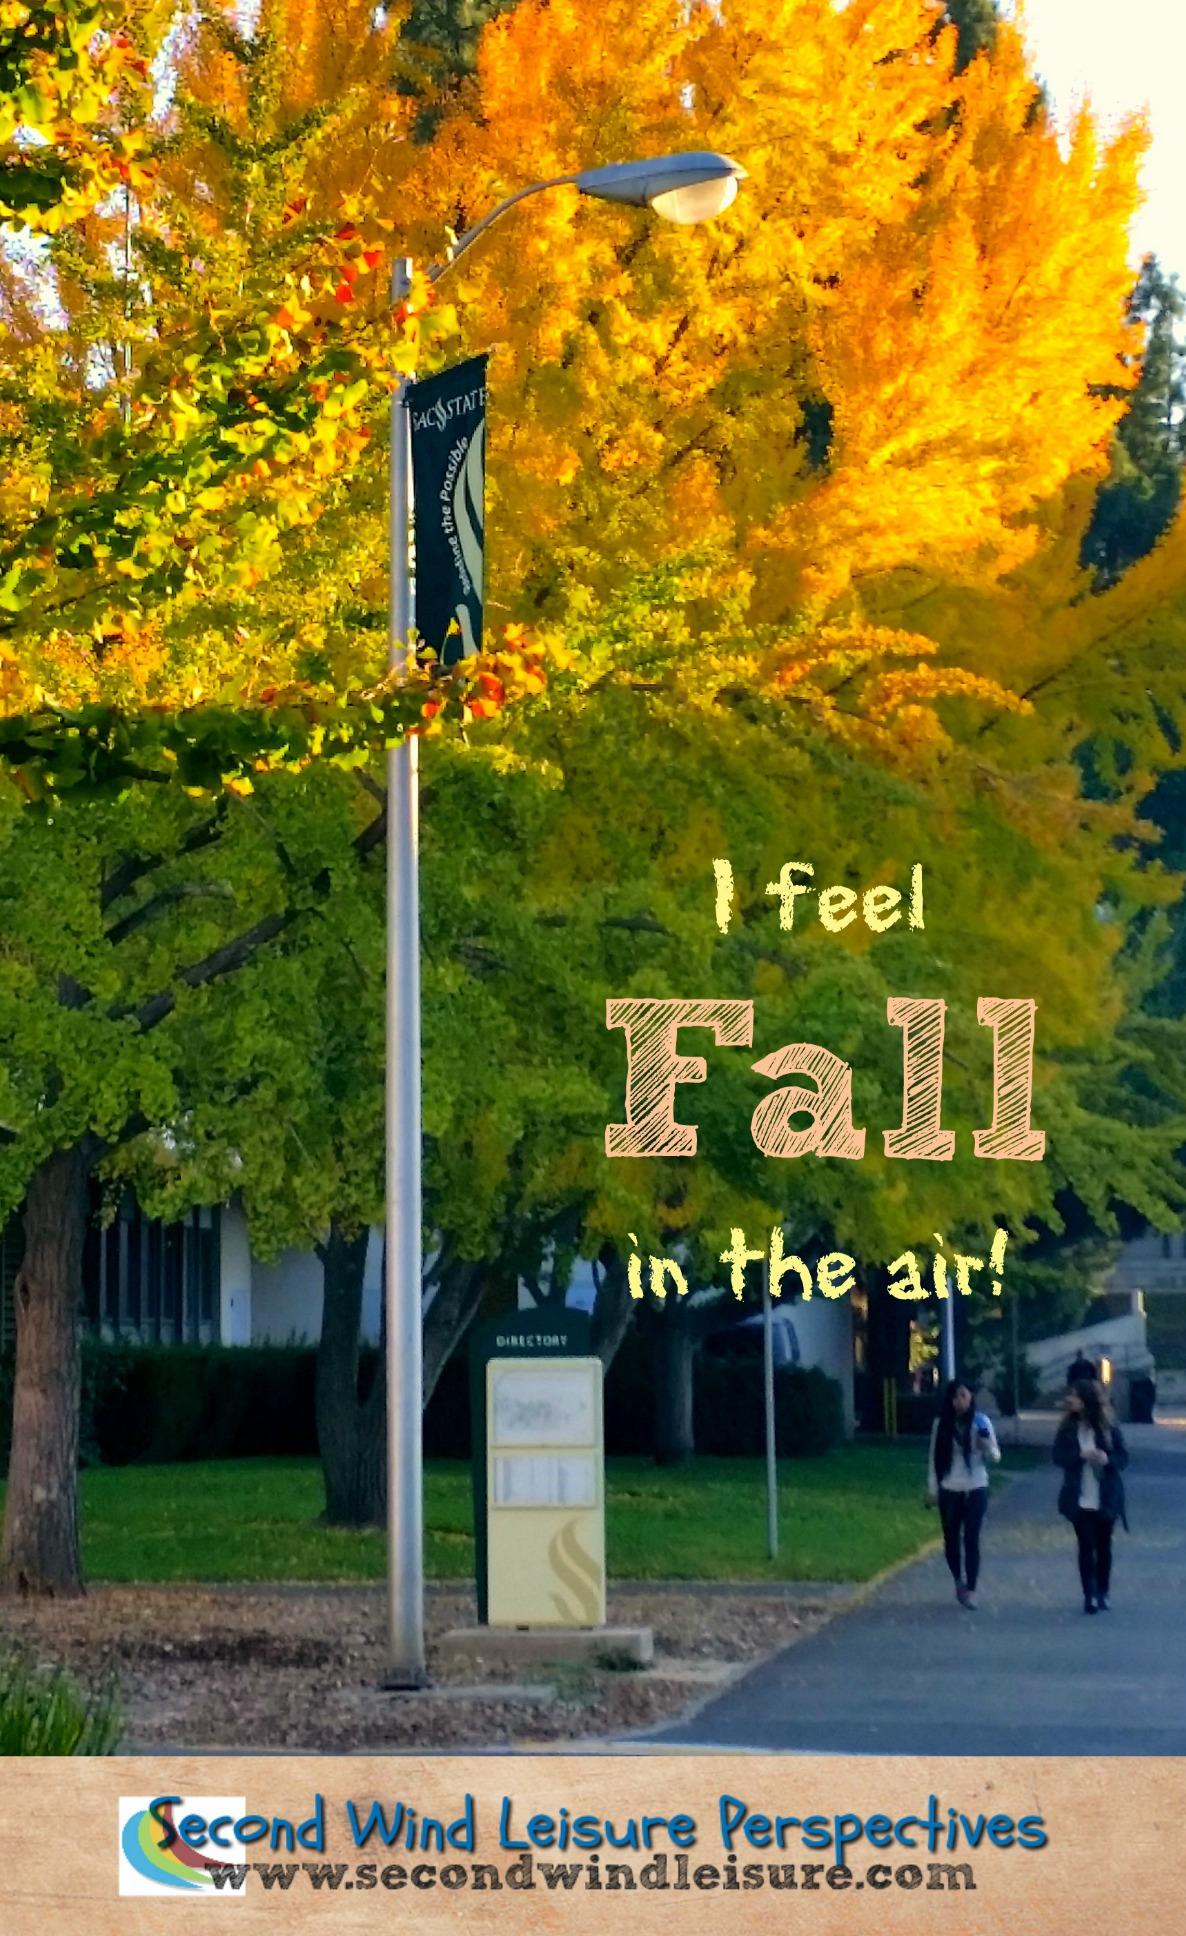 Autumn descends on students